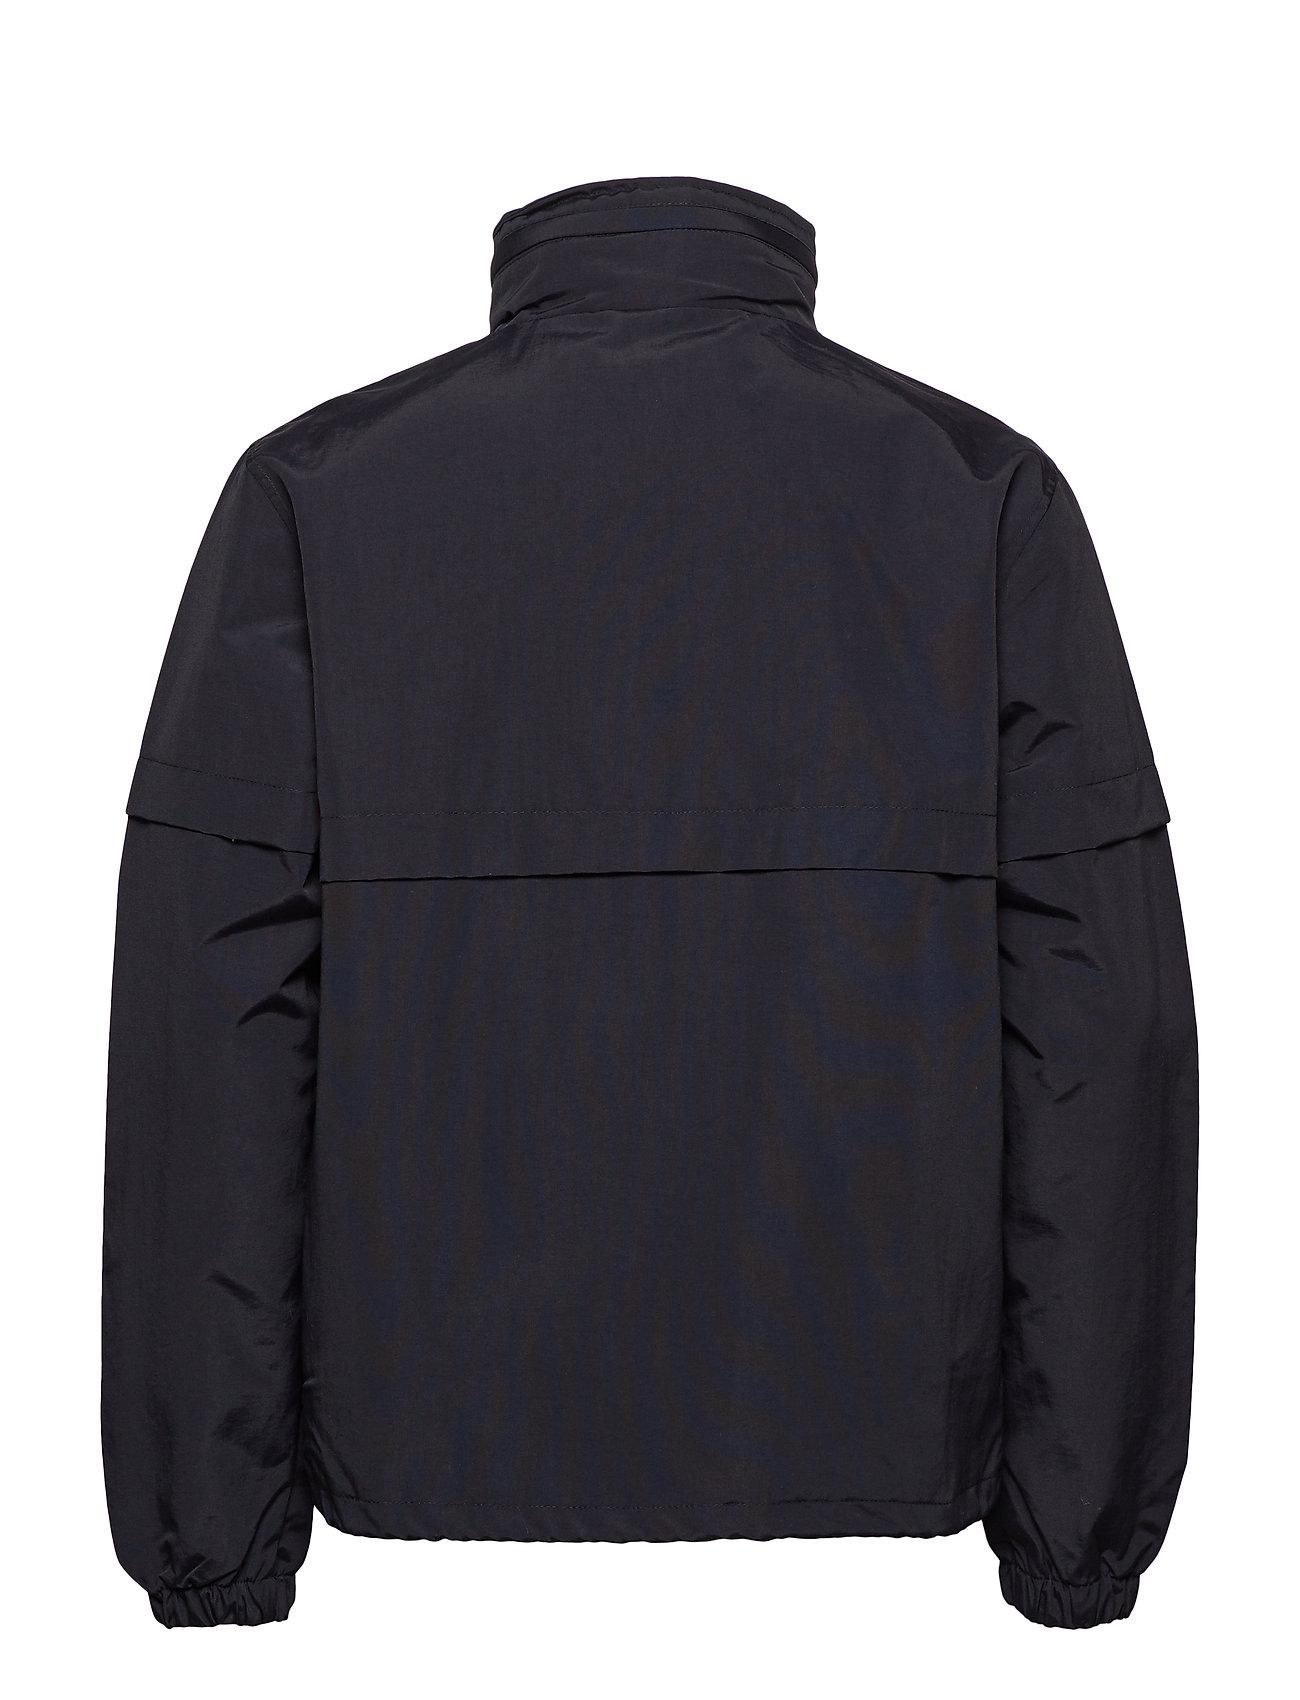 Black Pck Logo Jeans Klein Institutional whiteCalvin c4j35LqAR